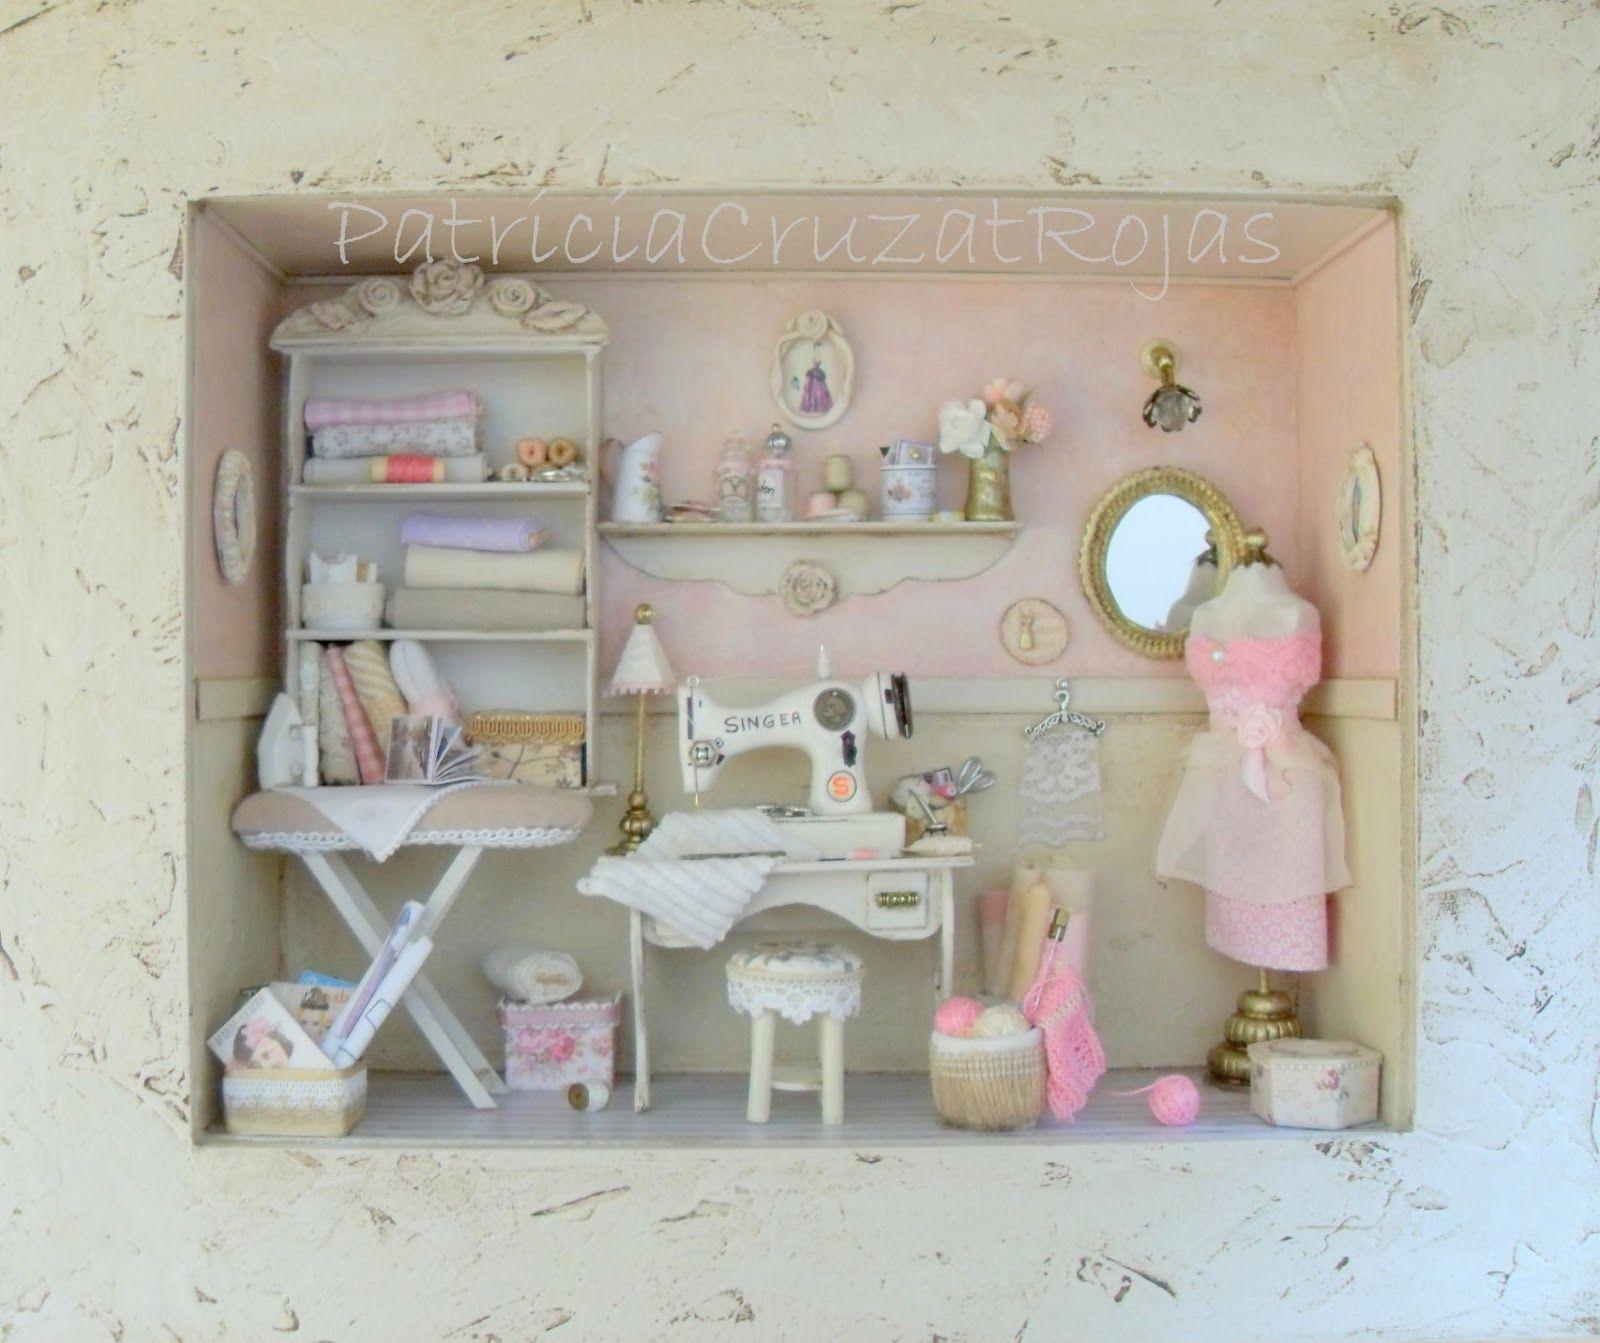 cuadro cuarto costura con miniaturas rosa y crema estilo shabby chic protegido con vidrio